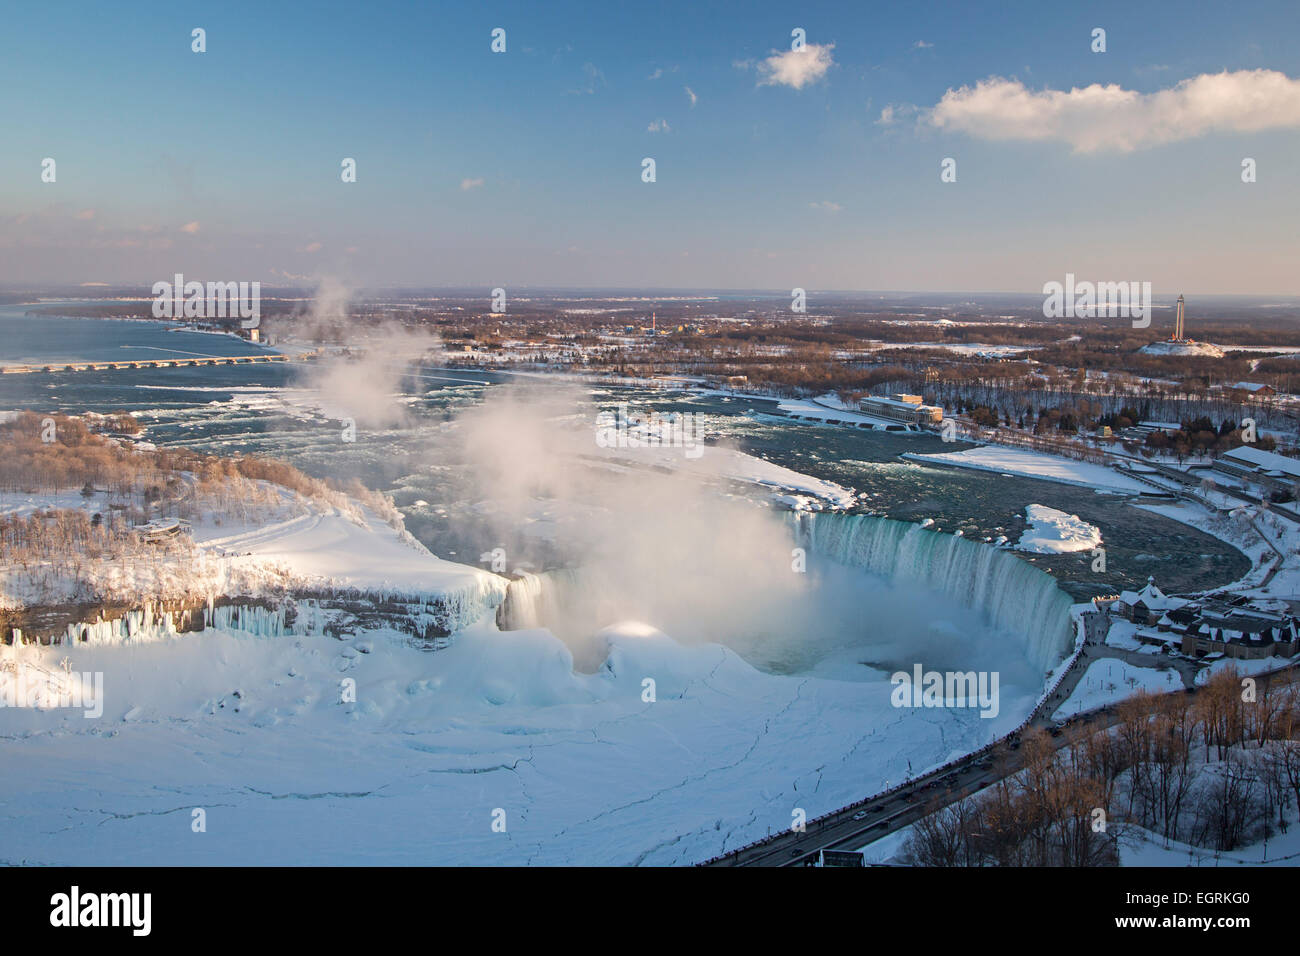 Niagara Falls, Ontario - Niagara Falls in winter. The Canadian Falls, or Horseshoe Falls, is at right. - Stock Image